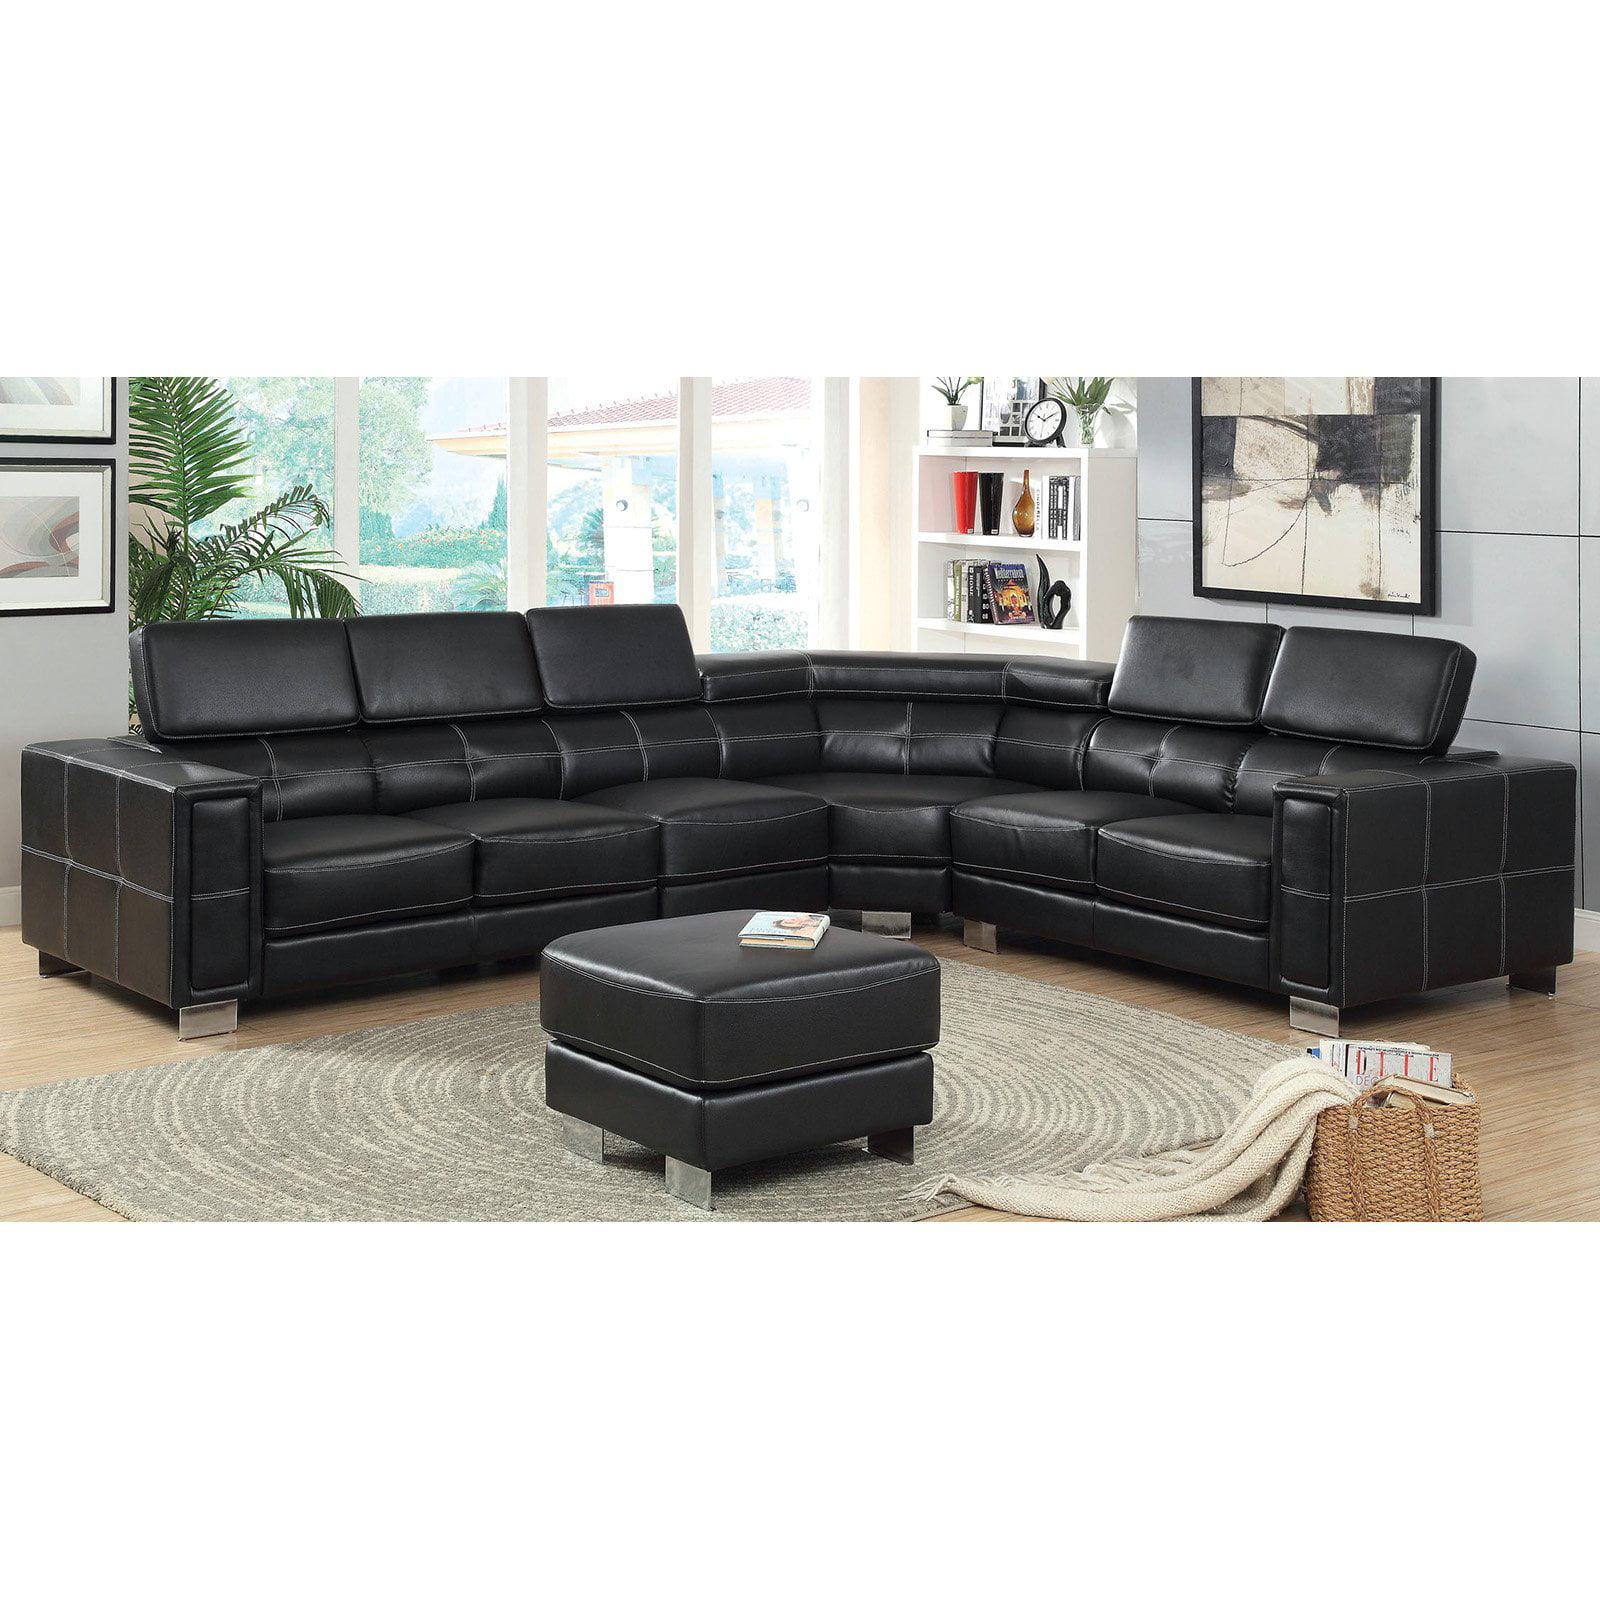 Furniture of America Becks Sectional Sofa Black Walmart